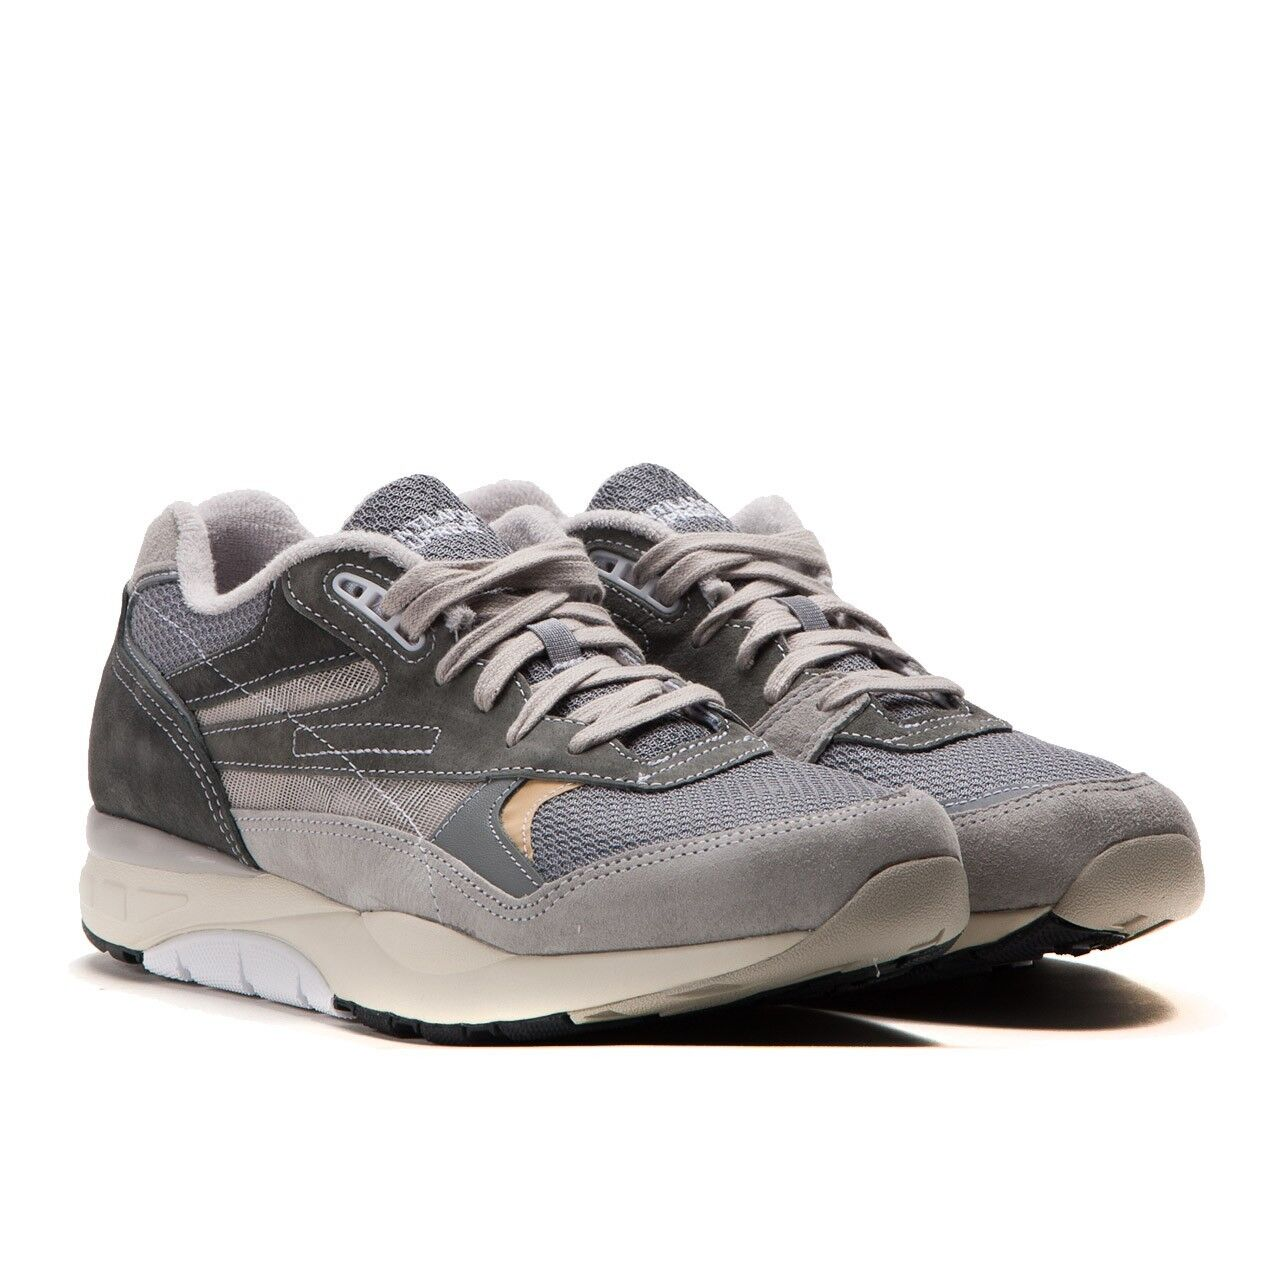 Reebok x Garbstore Ventilator EUR Supreme Sneakers Schuhe M48361 EUR Ventilator 47 US 13 UK 12 f6644b